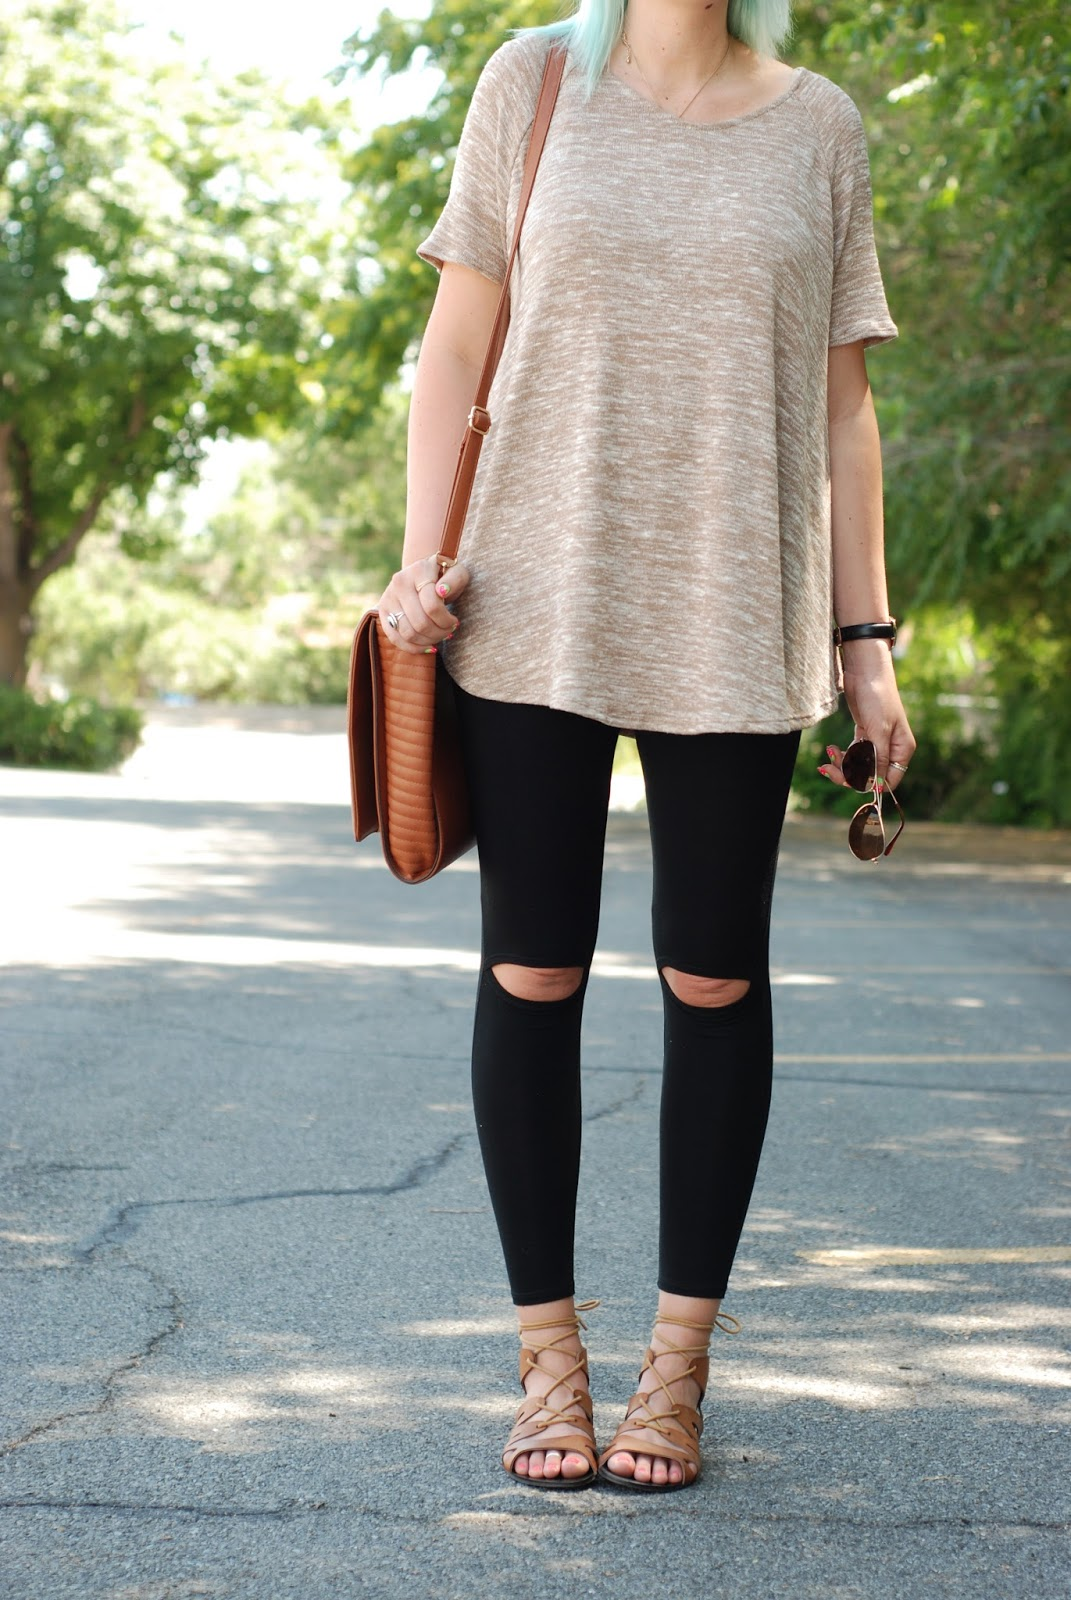 Ripped Knee Leggings, Sidney Clark Designs, Utah Fashion Blogger